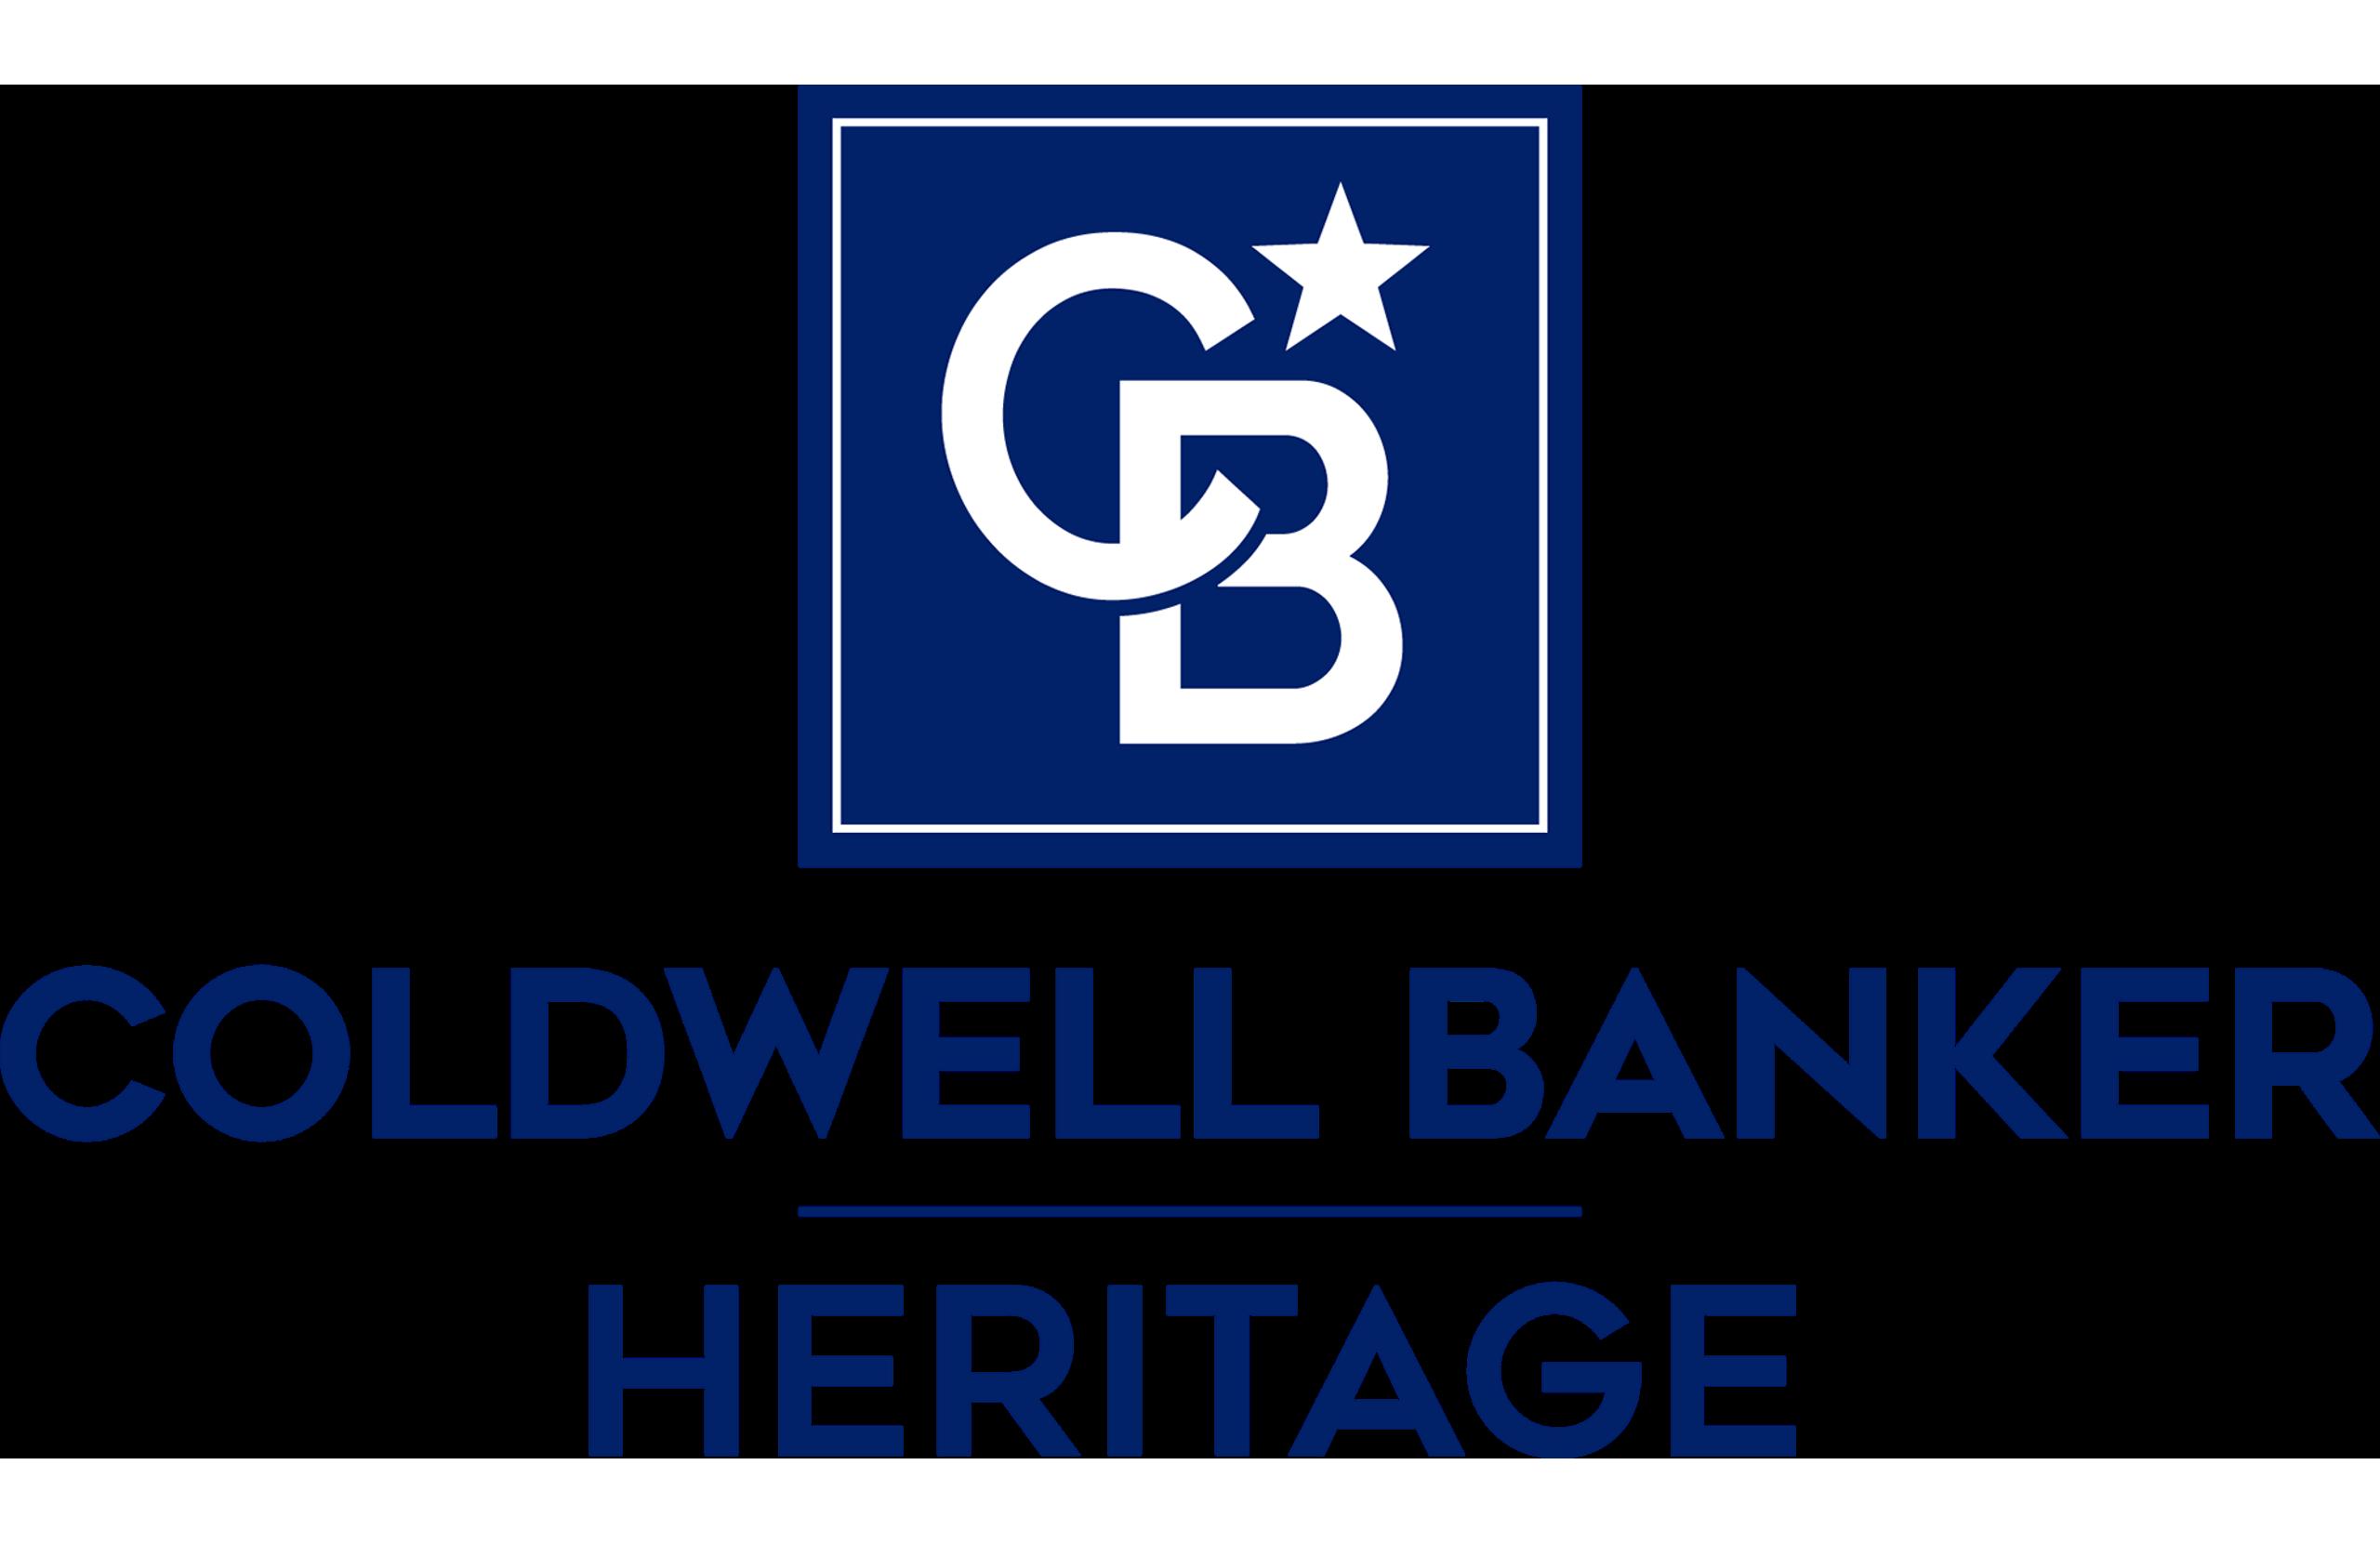 David Guyton - Coldwell Banker Heritage Logo